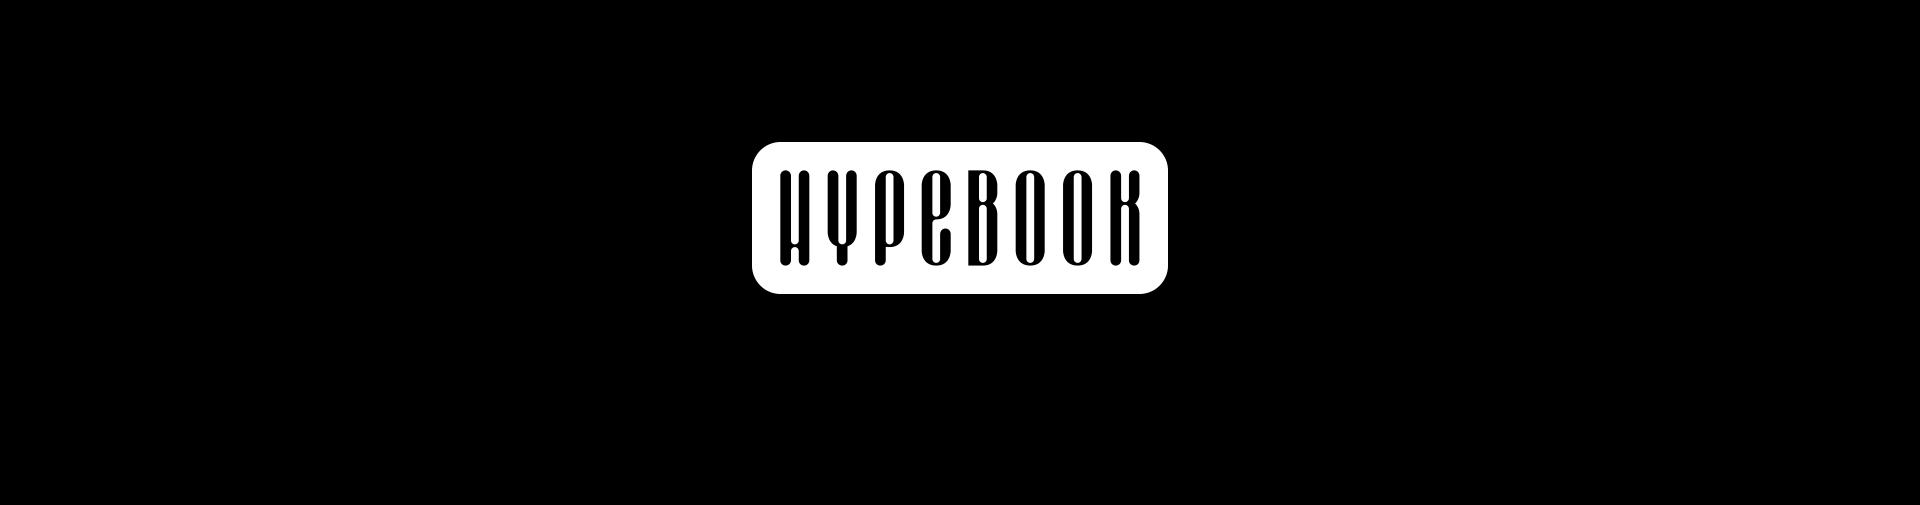 Hypebook